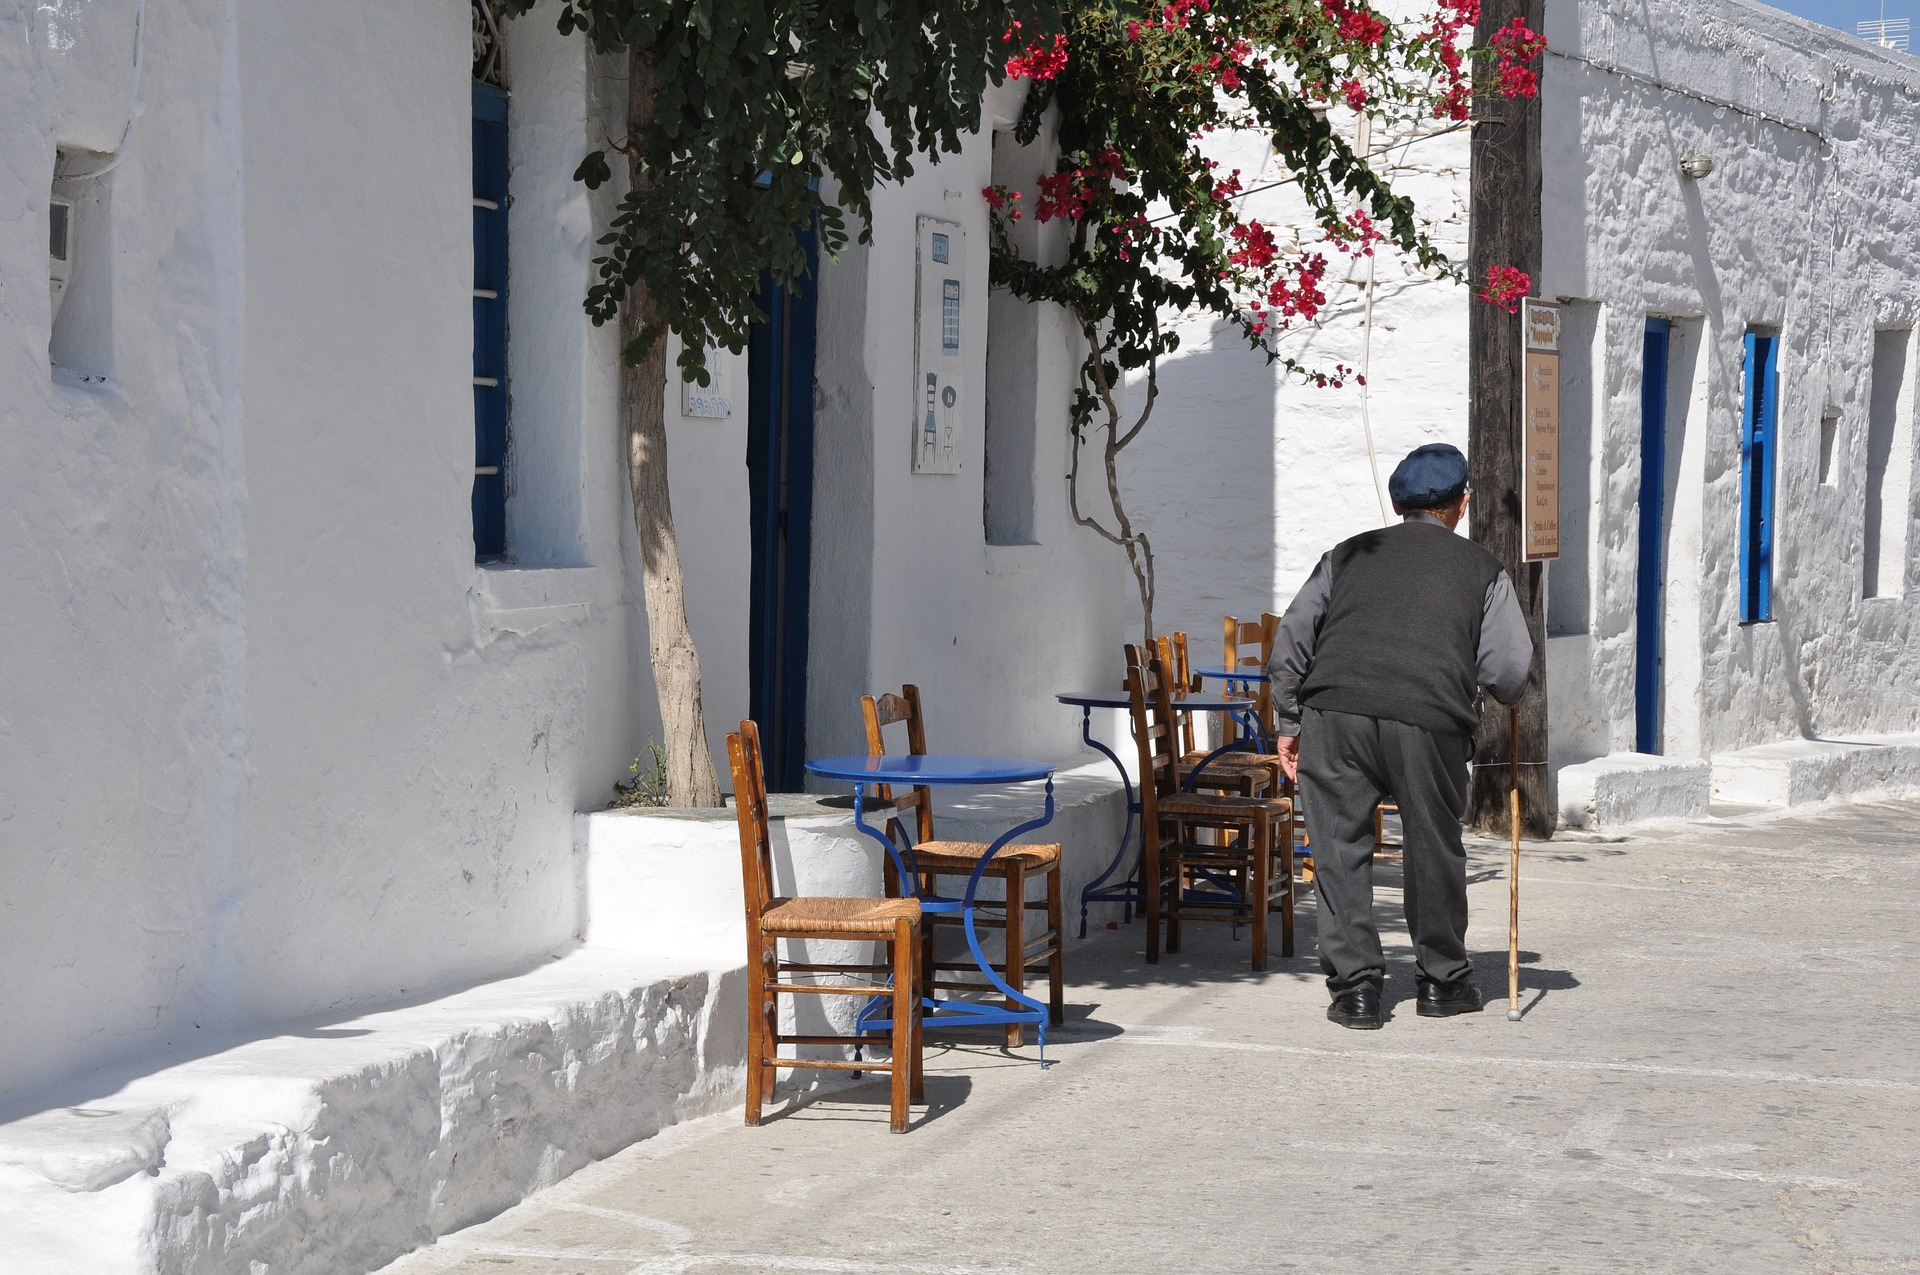 greece-1719060_1920